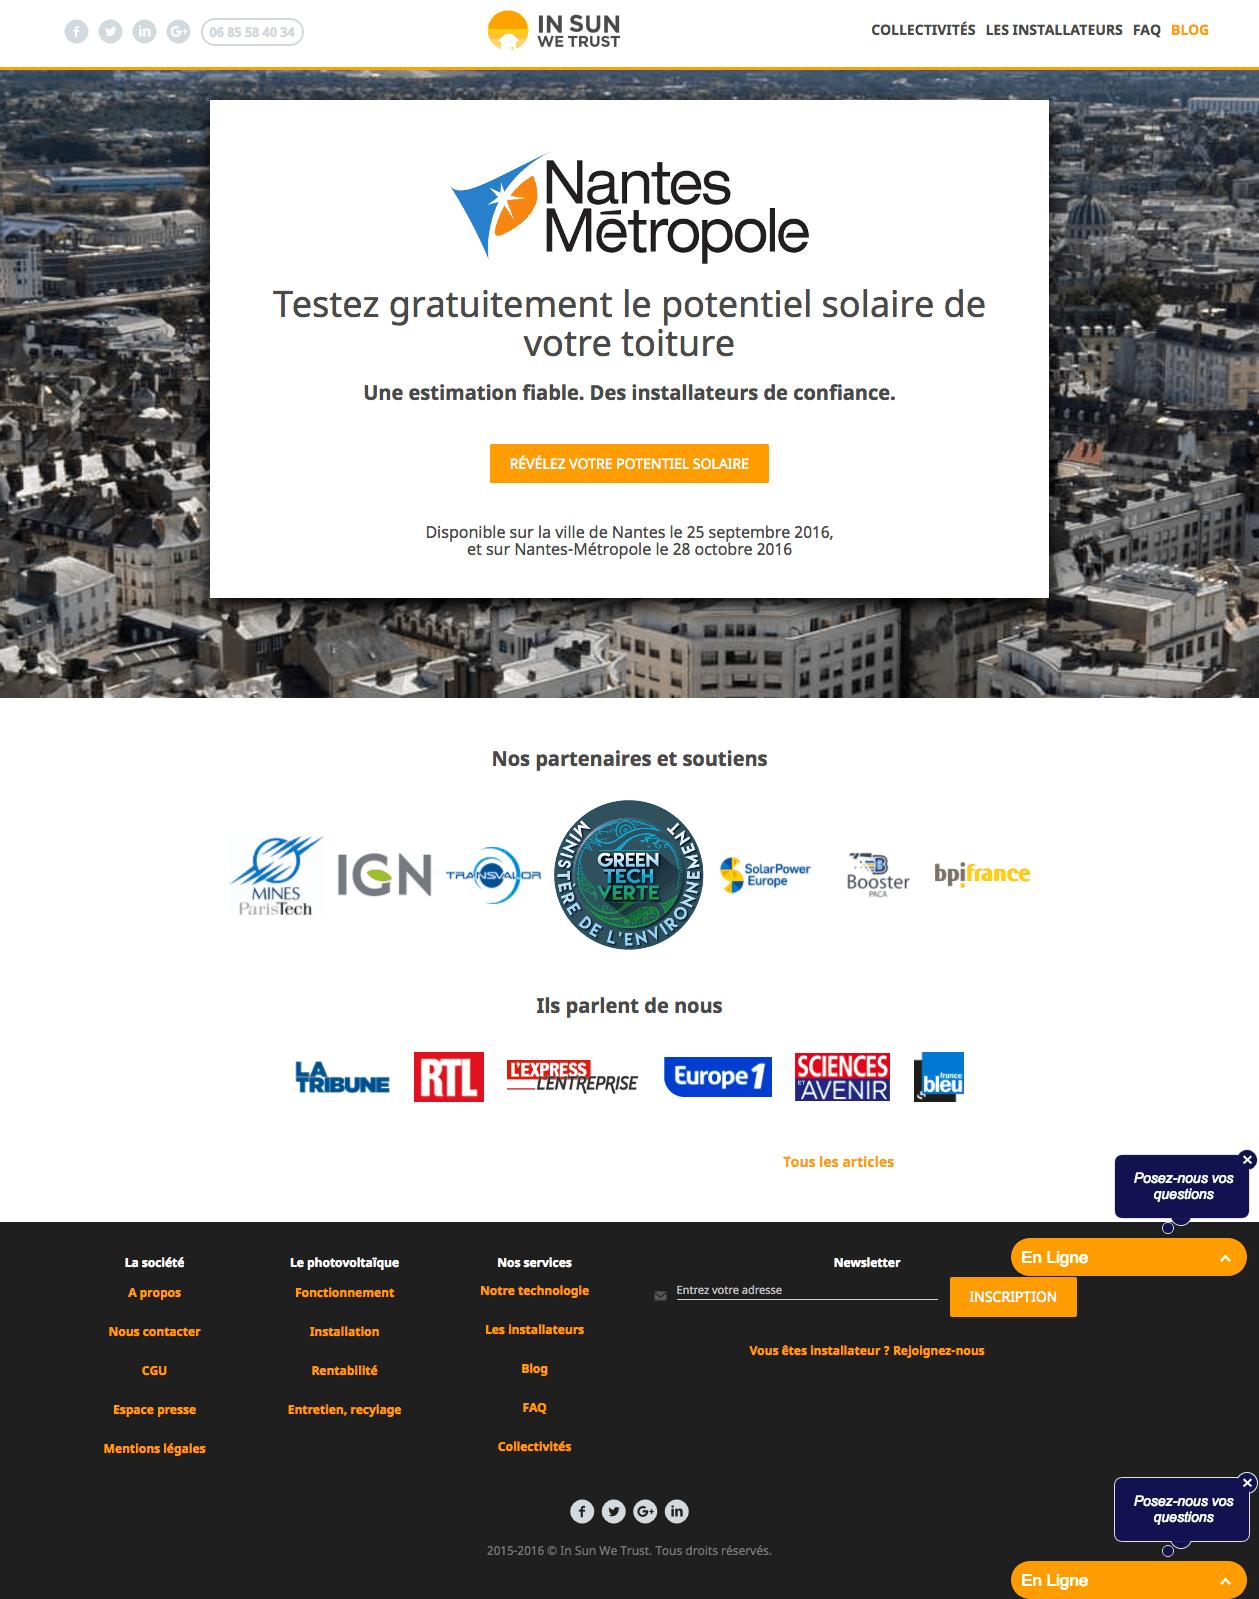 screencapture-nantes-metropole-insunwetrust-solar-1474534435946